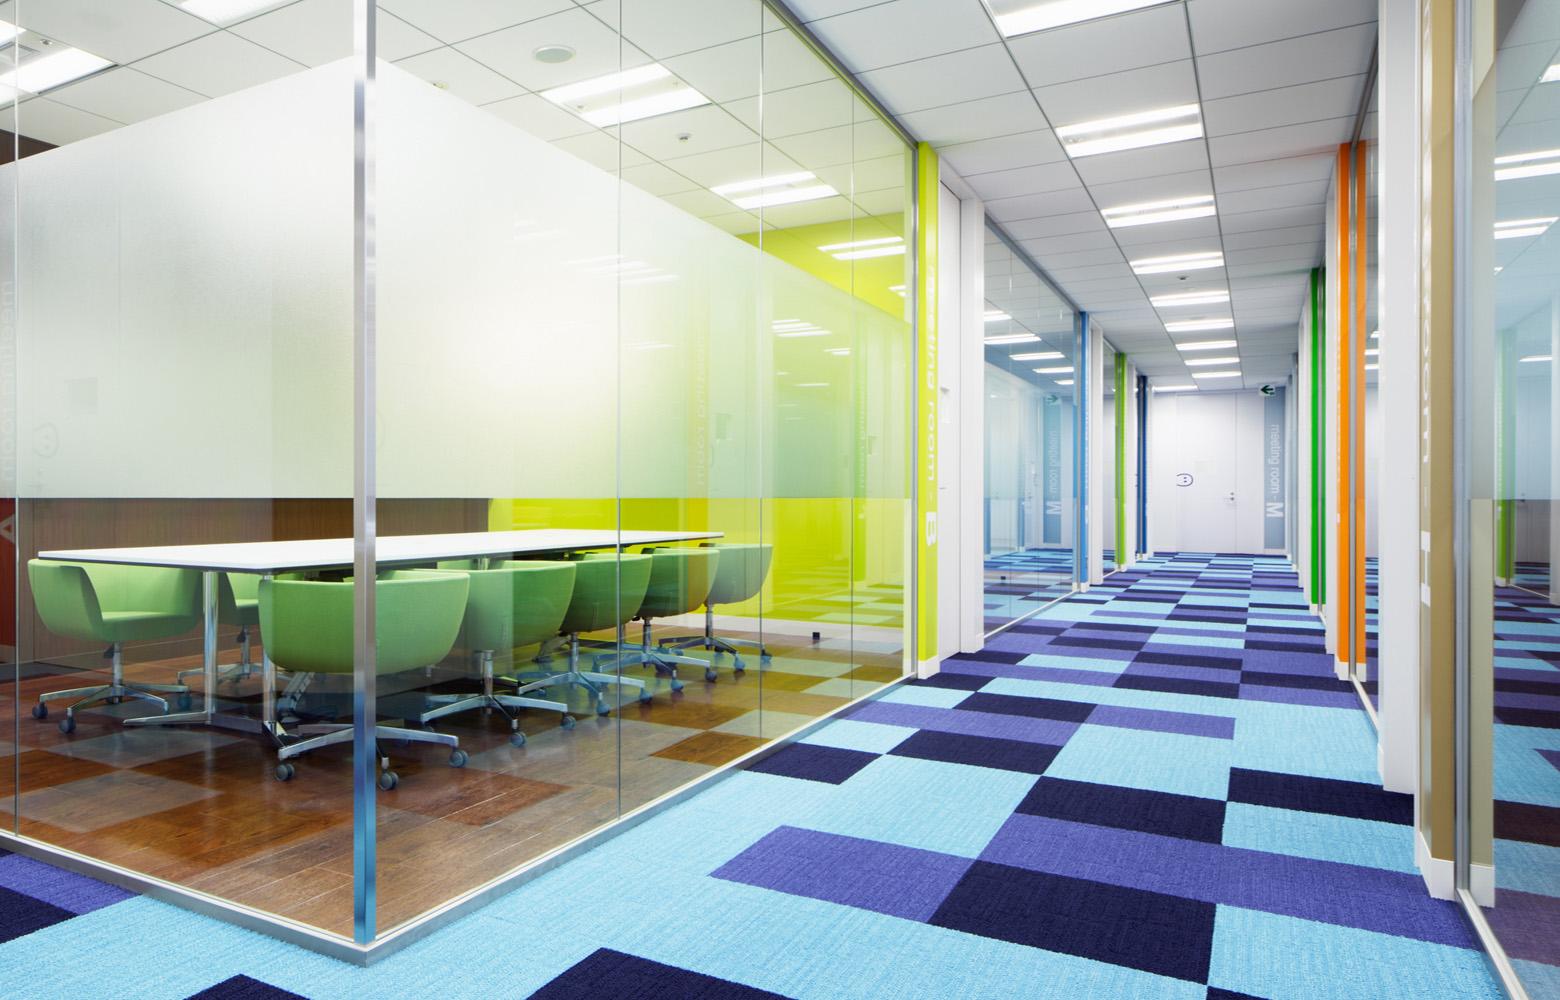 KLab株式会社 Meeting Room デザイン・レイアウト事例